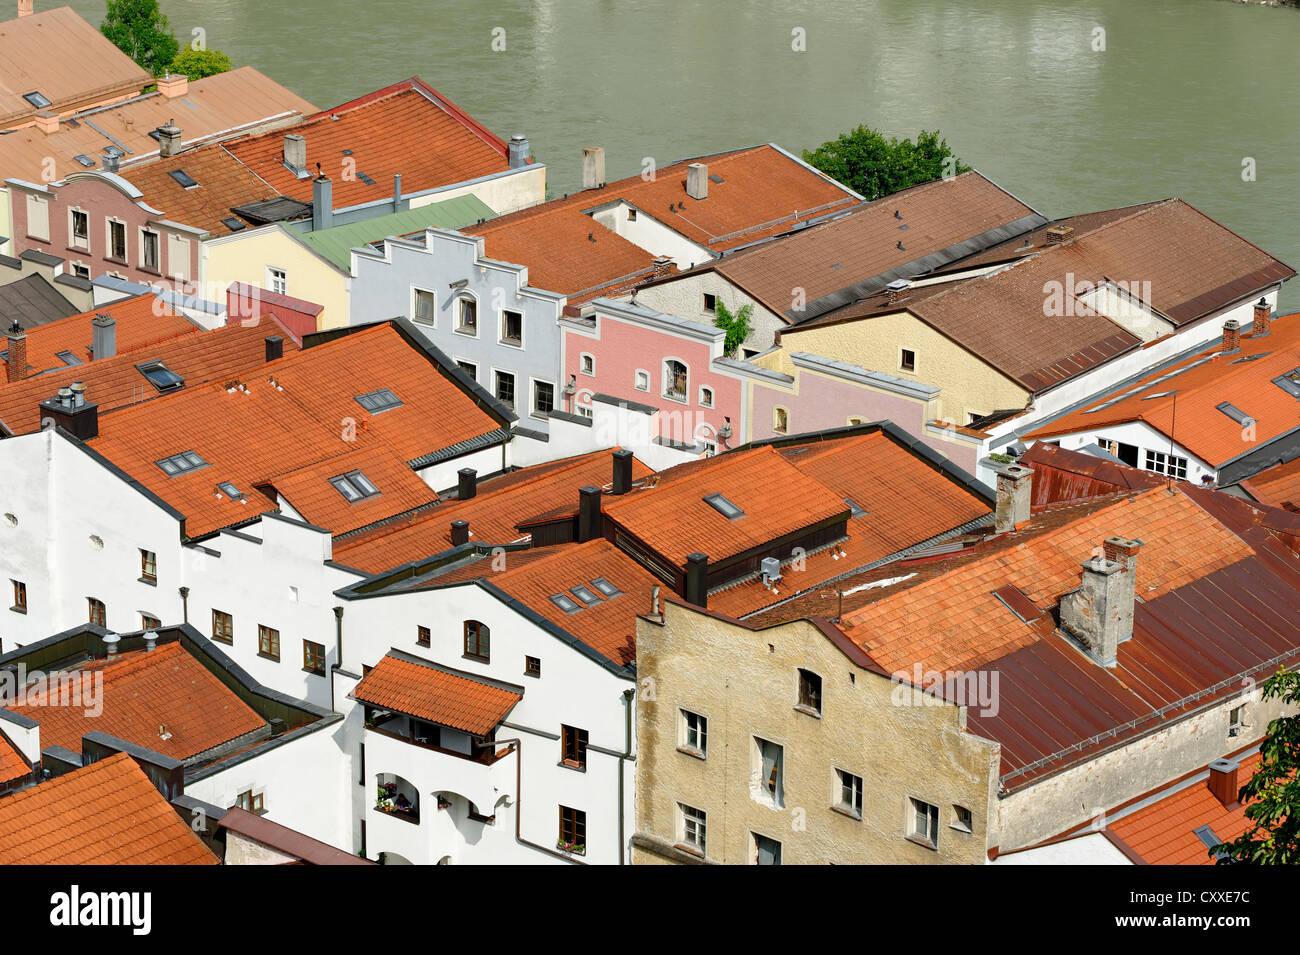 Houses in the Grueben lane with the Salzach river, Burghausen, Upper Bavaria, Bavaria - Stock Image